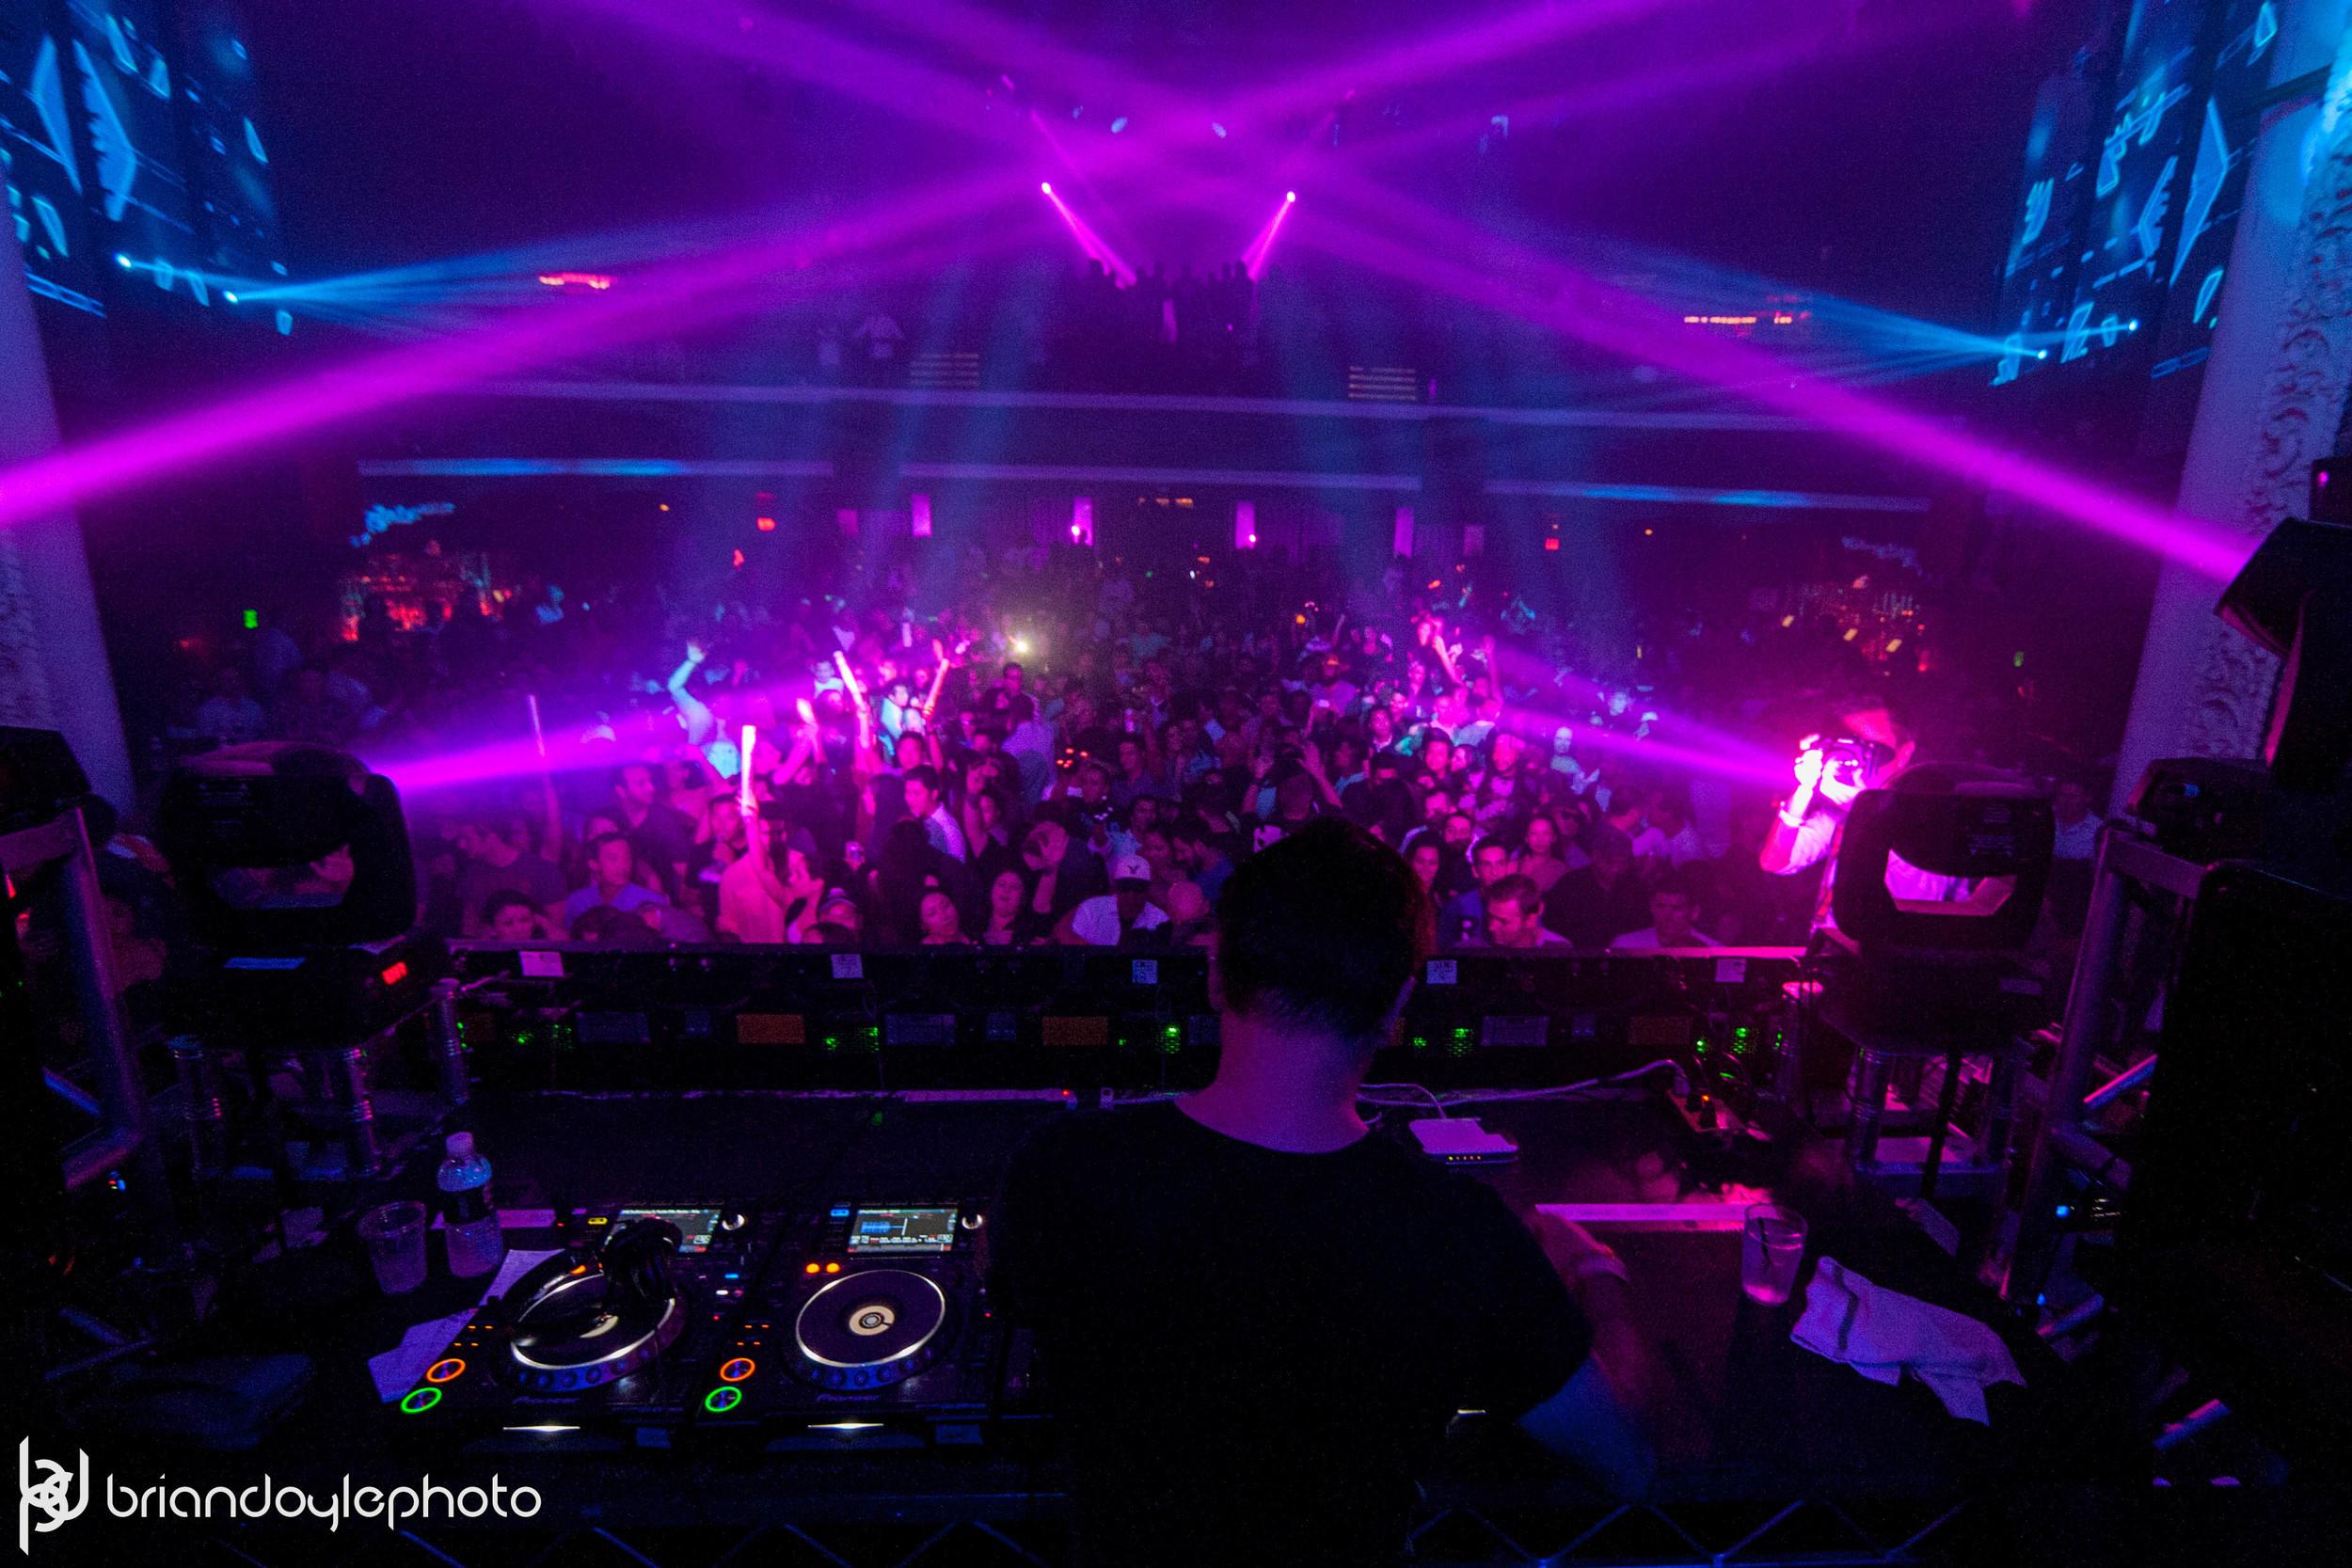 Jagermeister Presents - Paul Oakenfold @ Avalon bdp 27.09.14-39.jpg